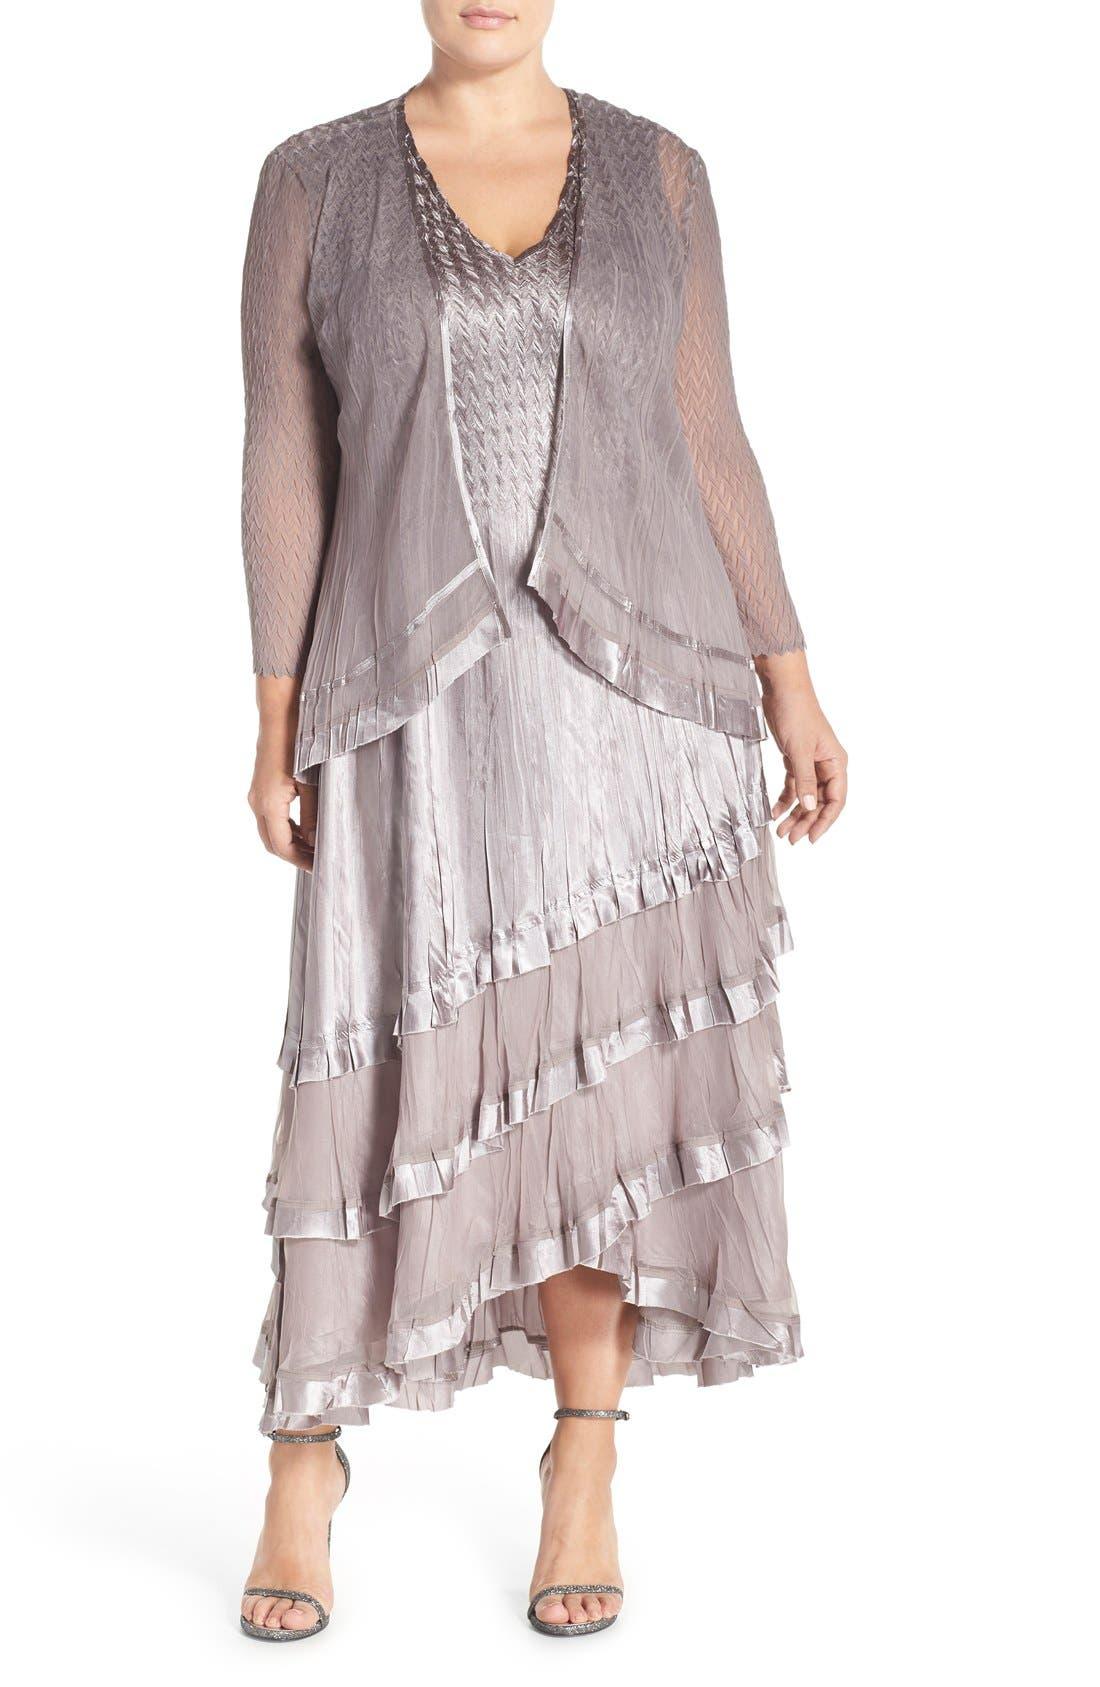 KOMAROV Charmeuse Tiered Hem Dress with Chiffon Jacket, Main, color, OYSTER SMOKE OMBRE